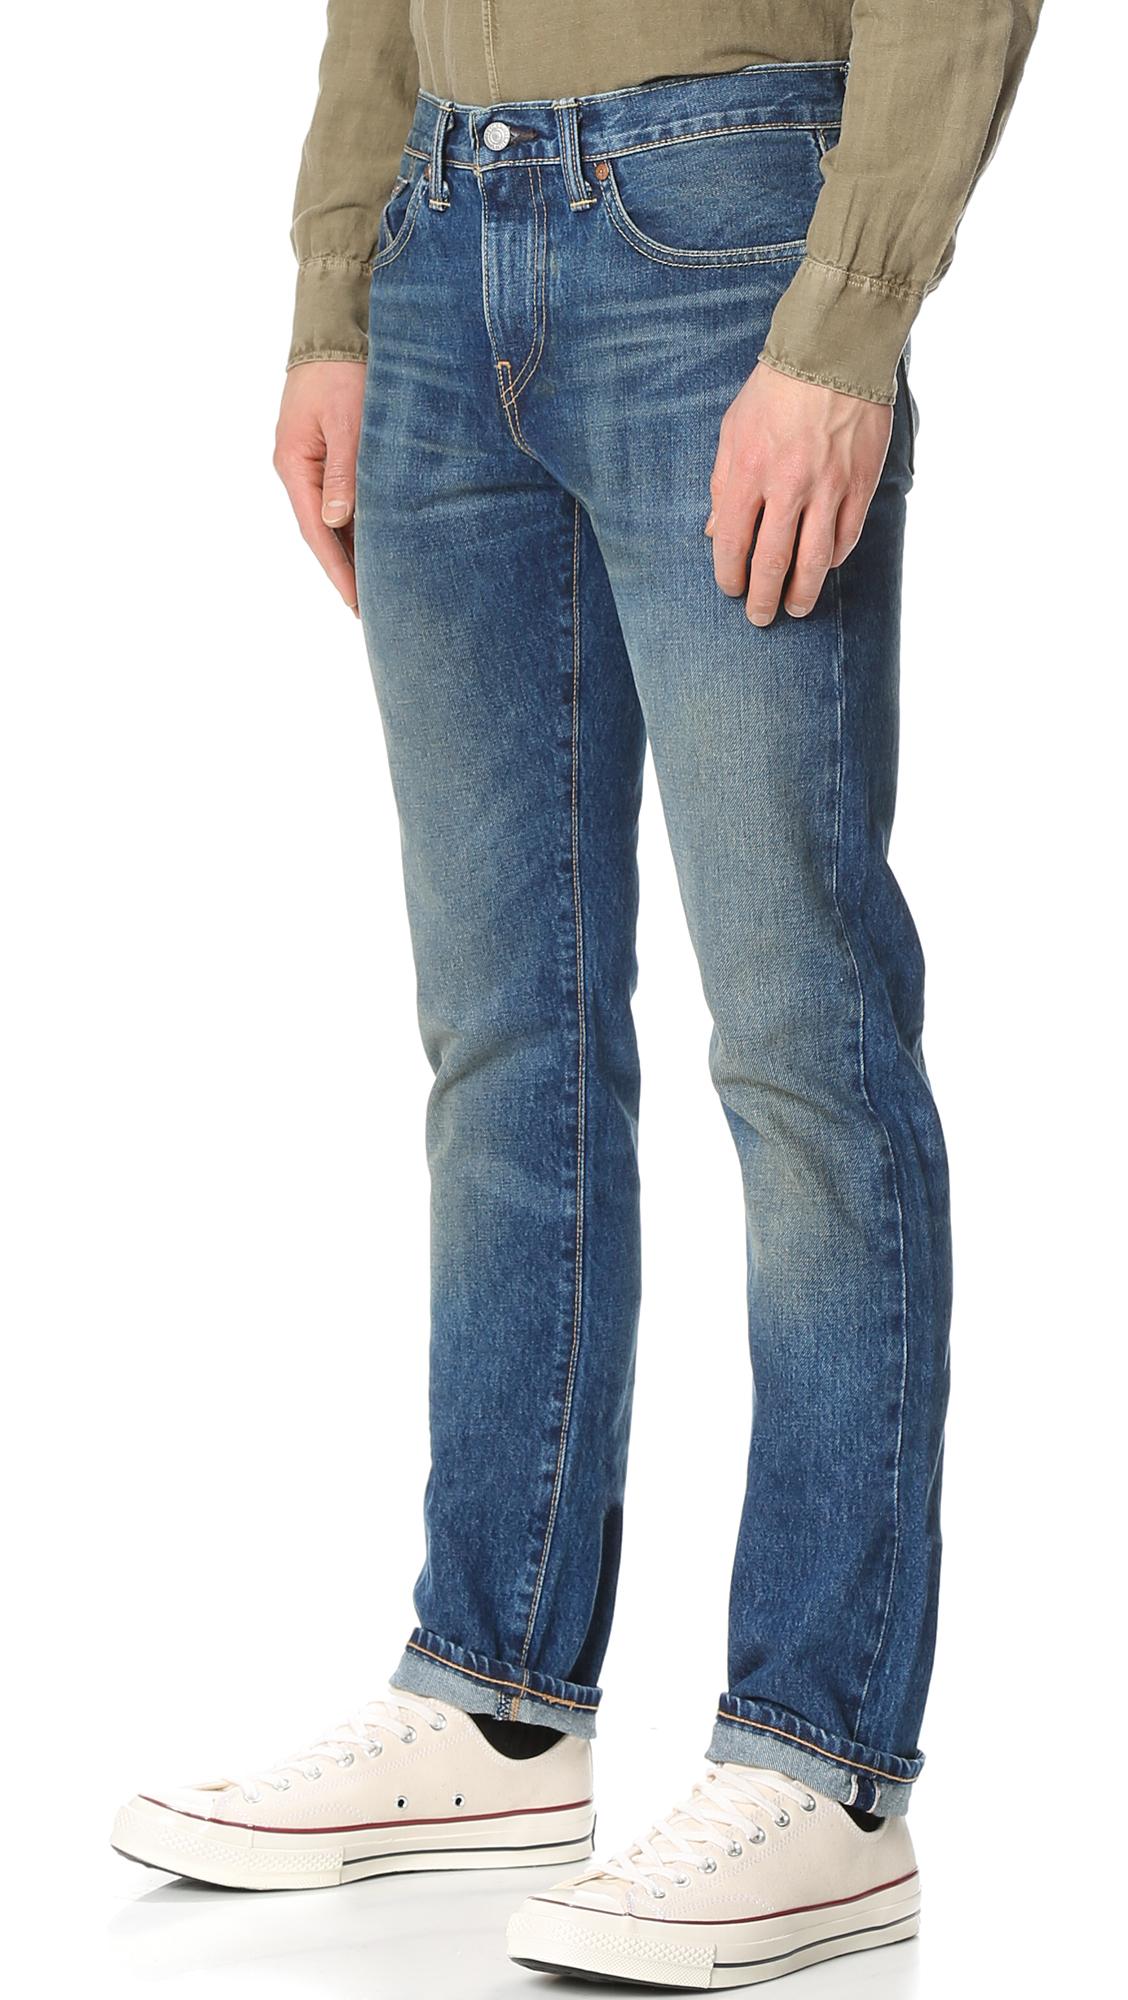 Dane Red Slim Levi's Selvedge 511 Tab Fit JeansEast iOkXPZuT